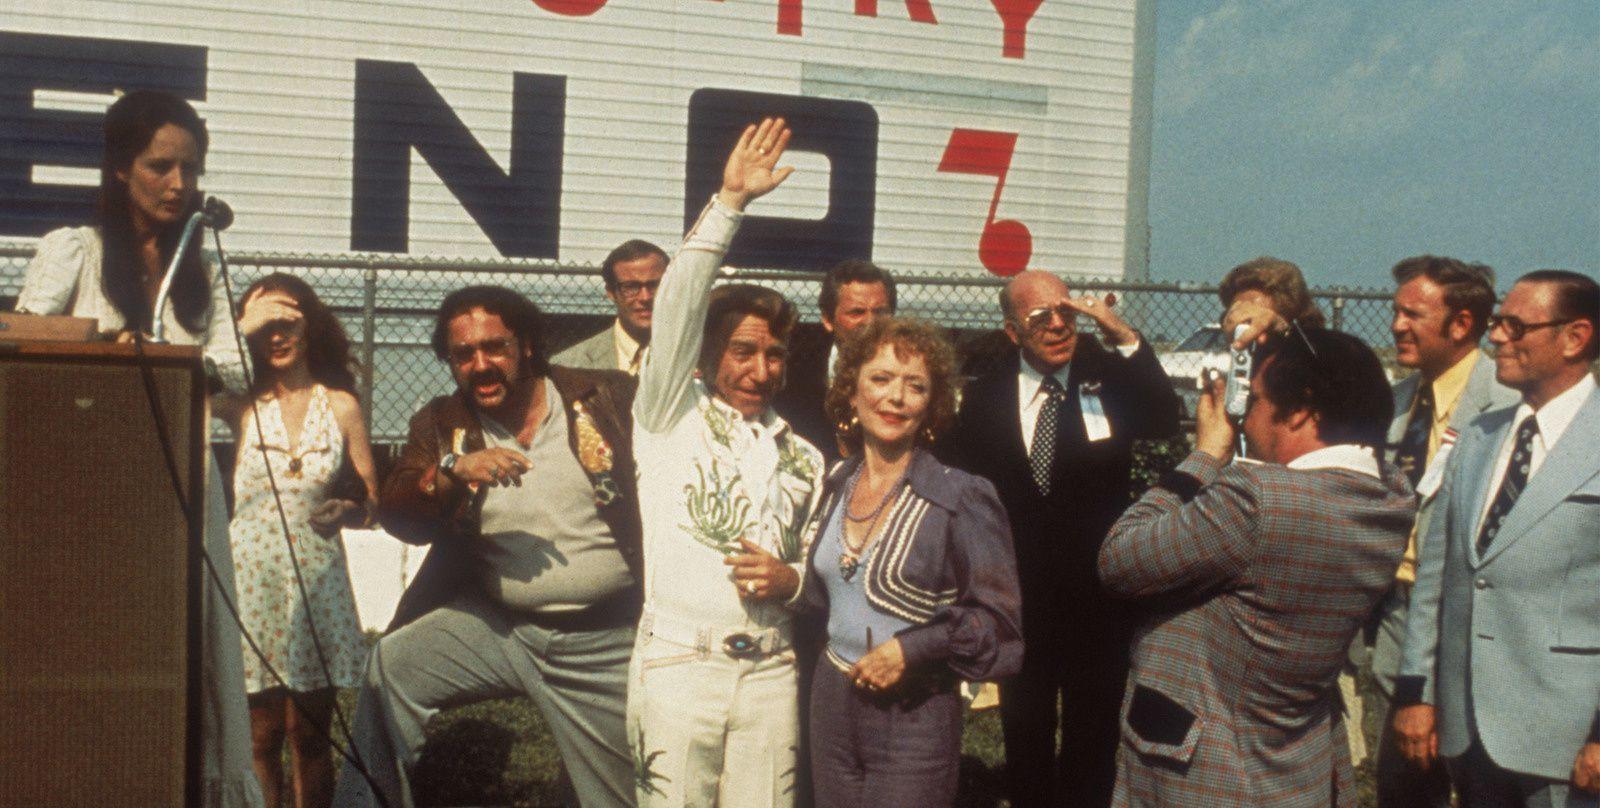 Nashville (1975) Robert Altman